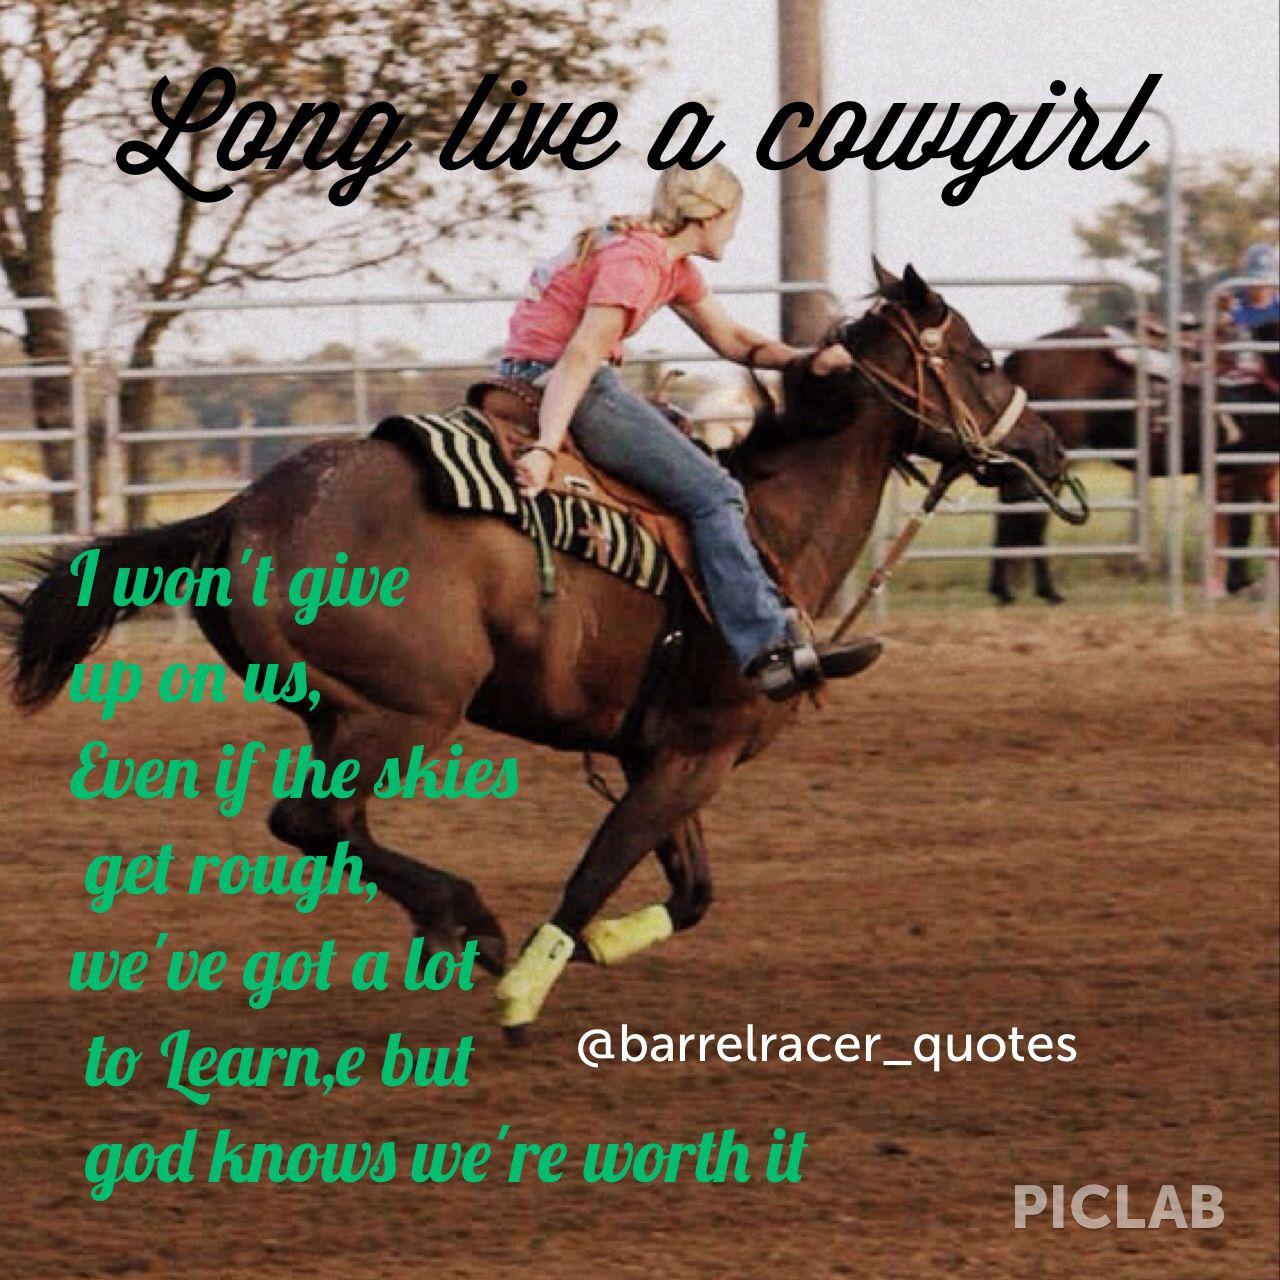 Barrel racing quotes me and my horse ❤️ | Cowgirl secrets | Barrel